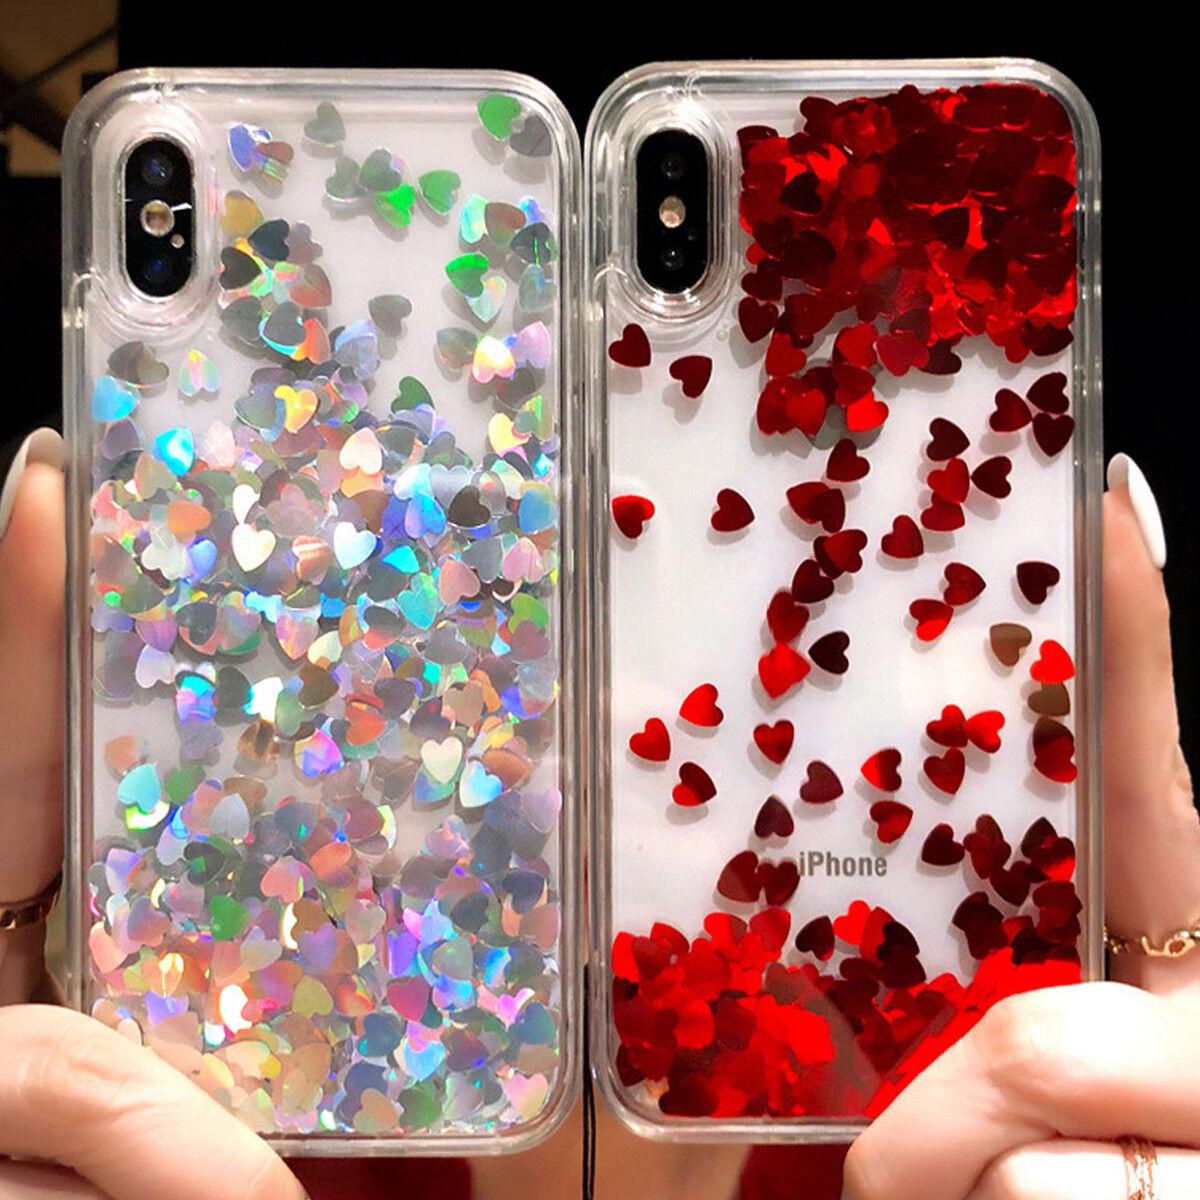 Iphone 11 Pro Max 8 Plus 6 7 Plus XS MAX XR Bling Glitter Cu